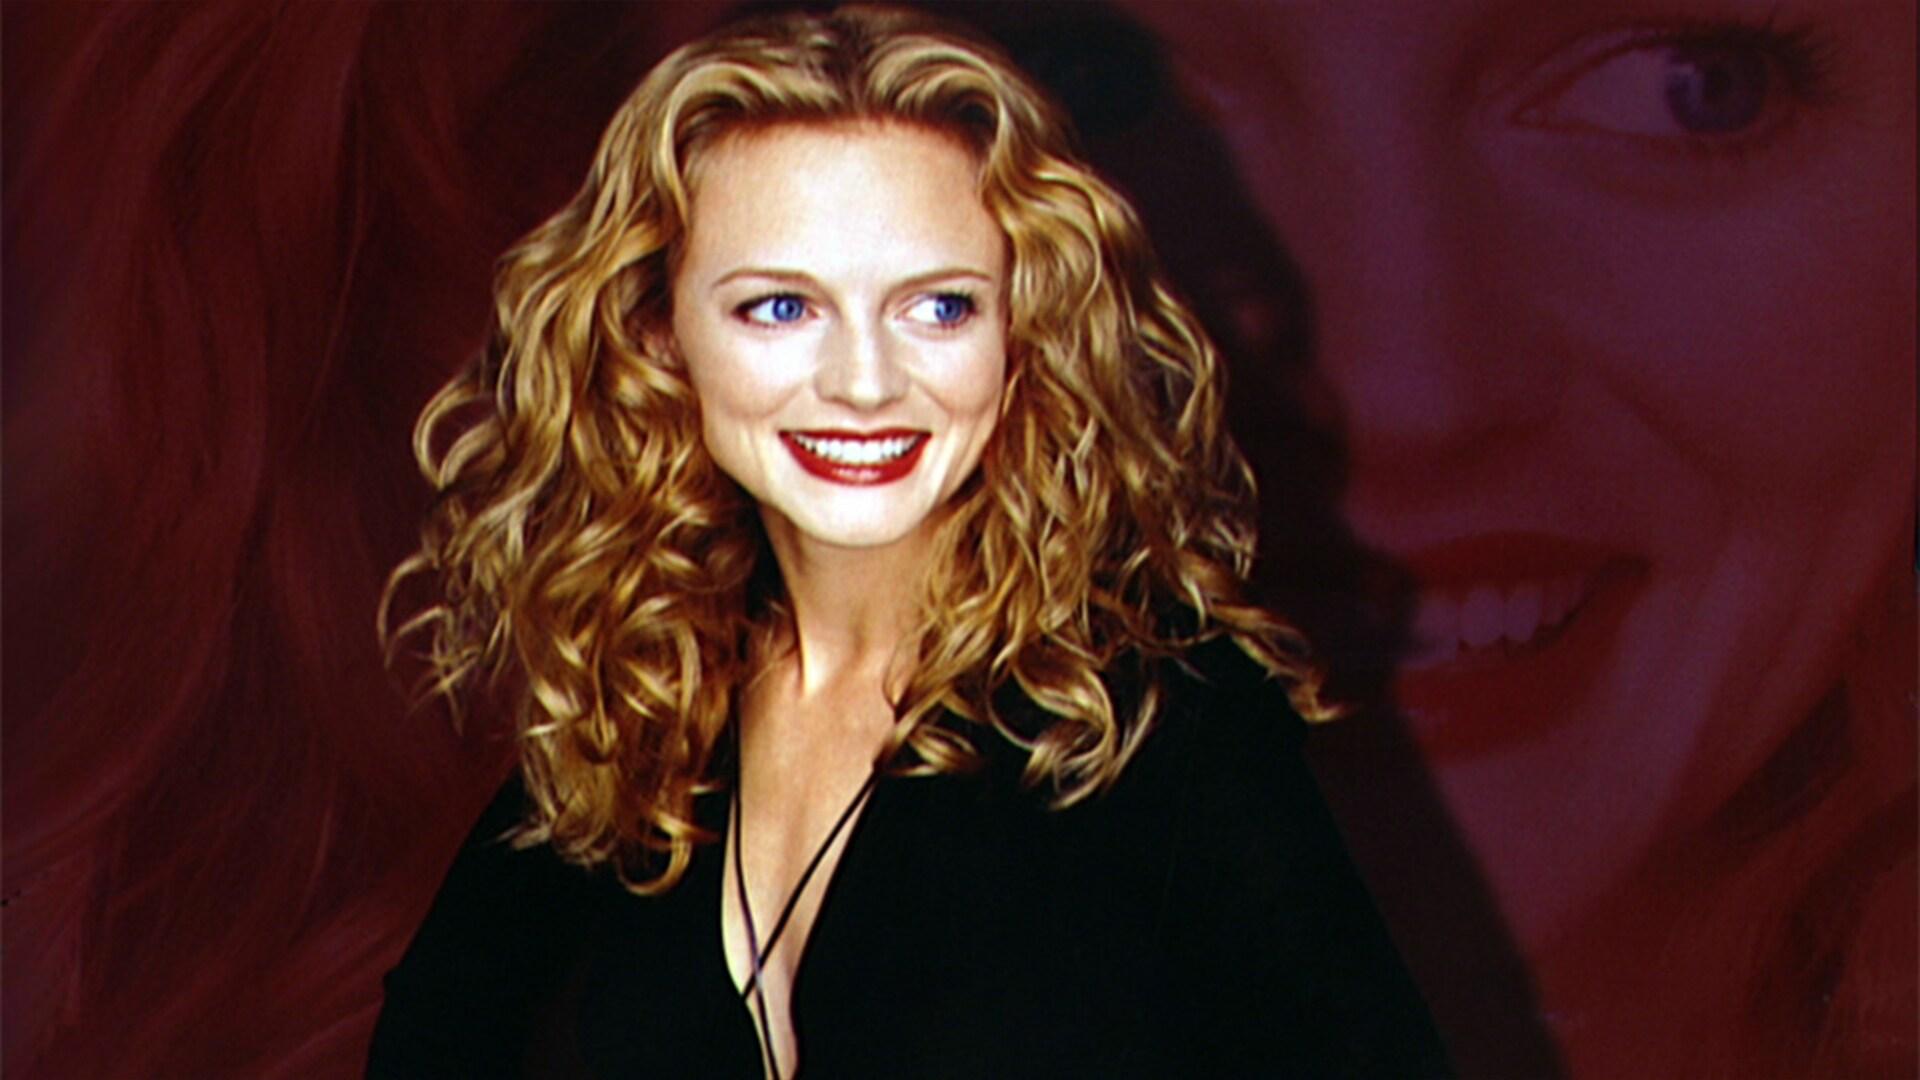 Heather Graham: October 16, 1999